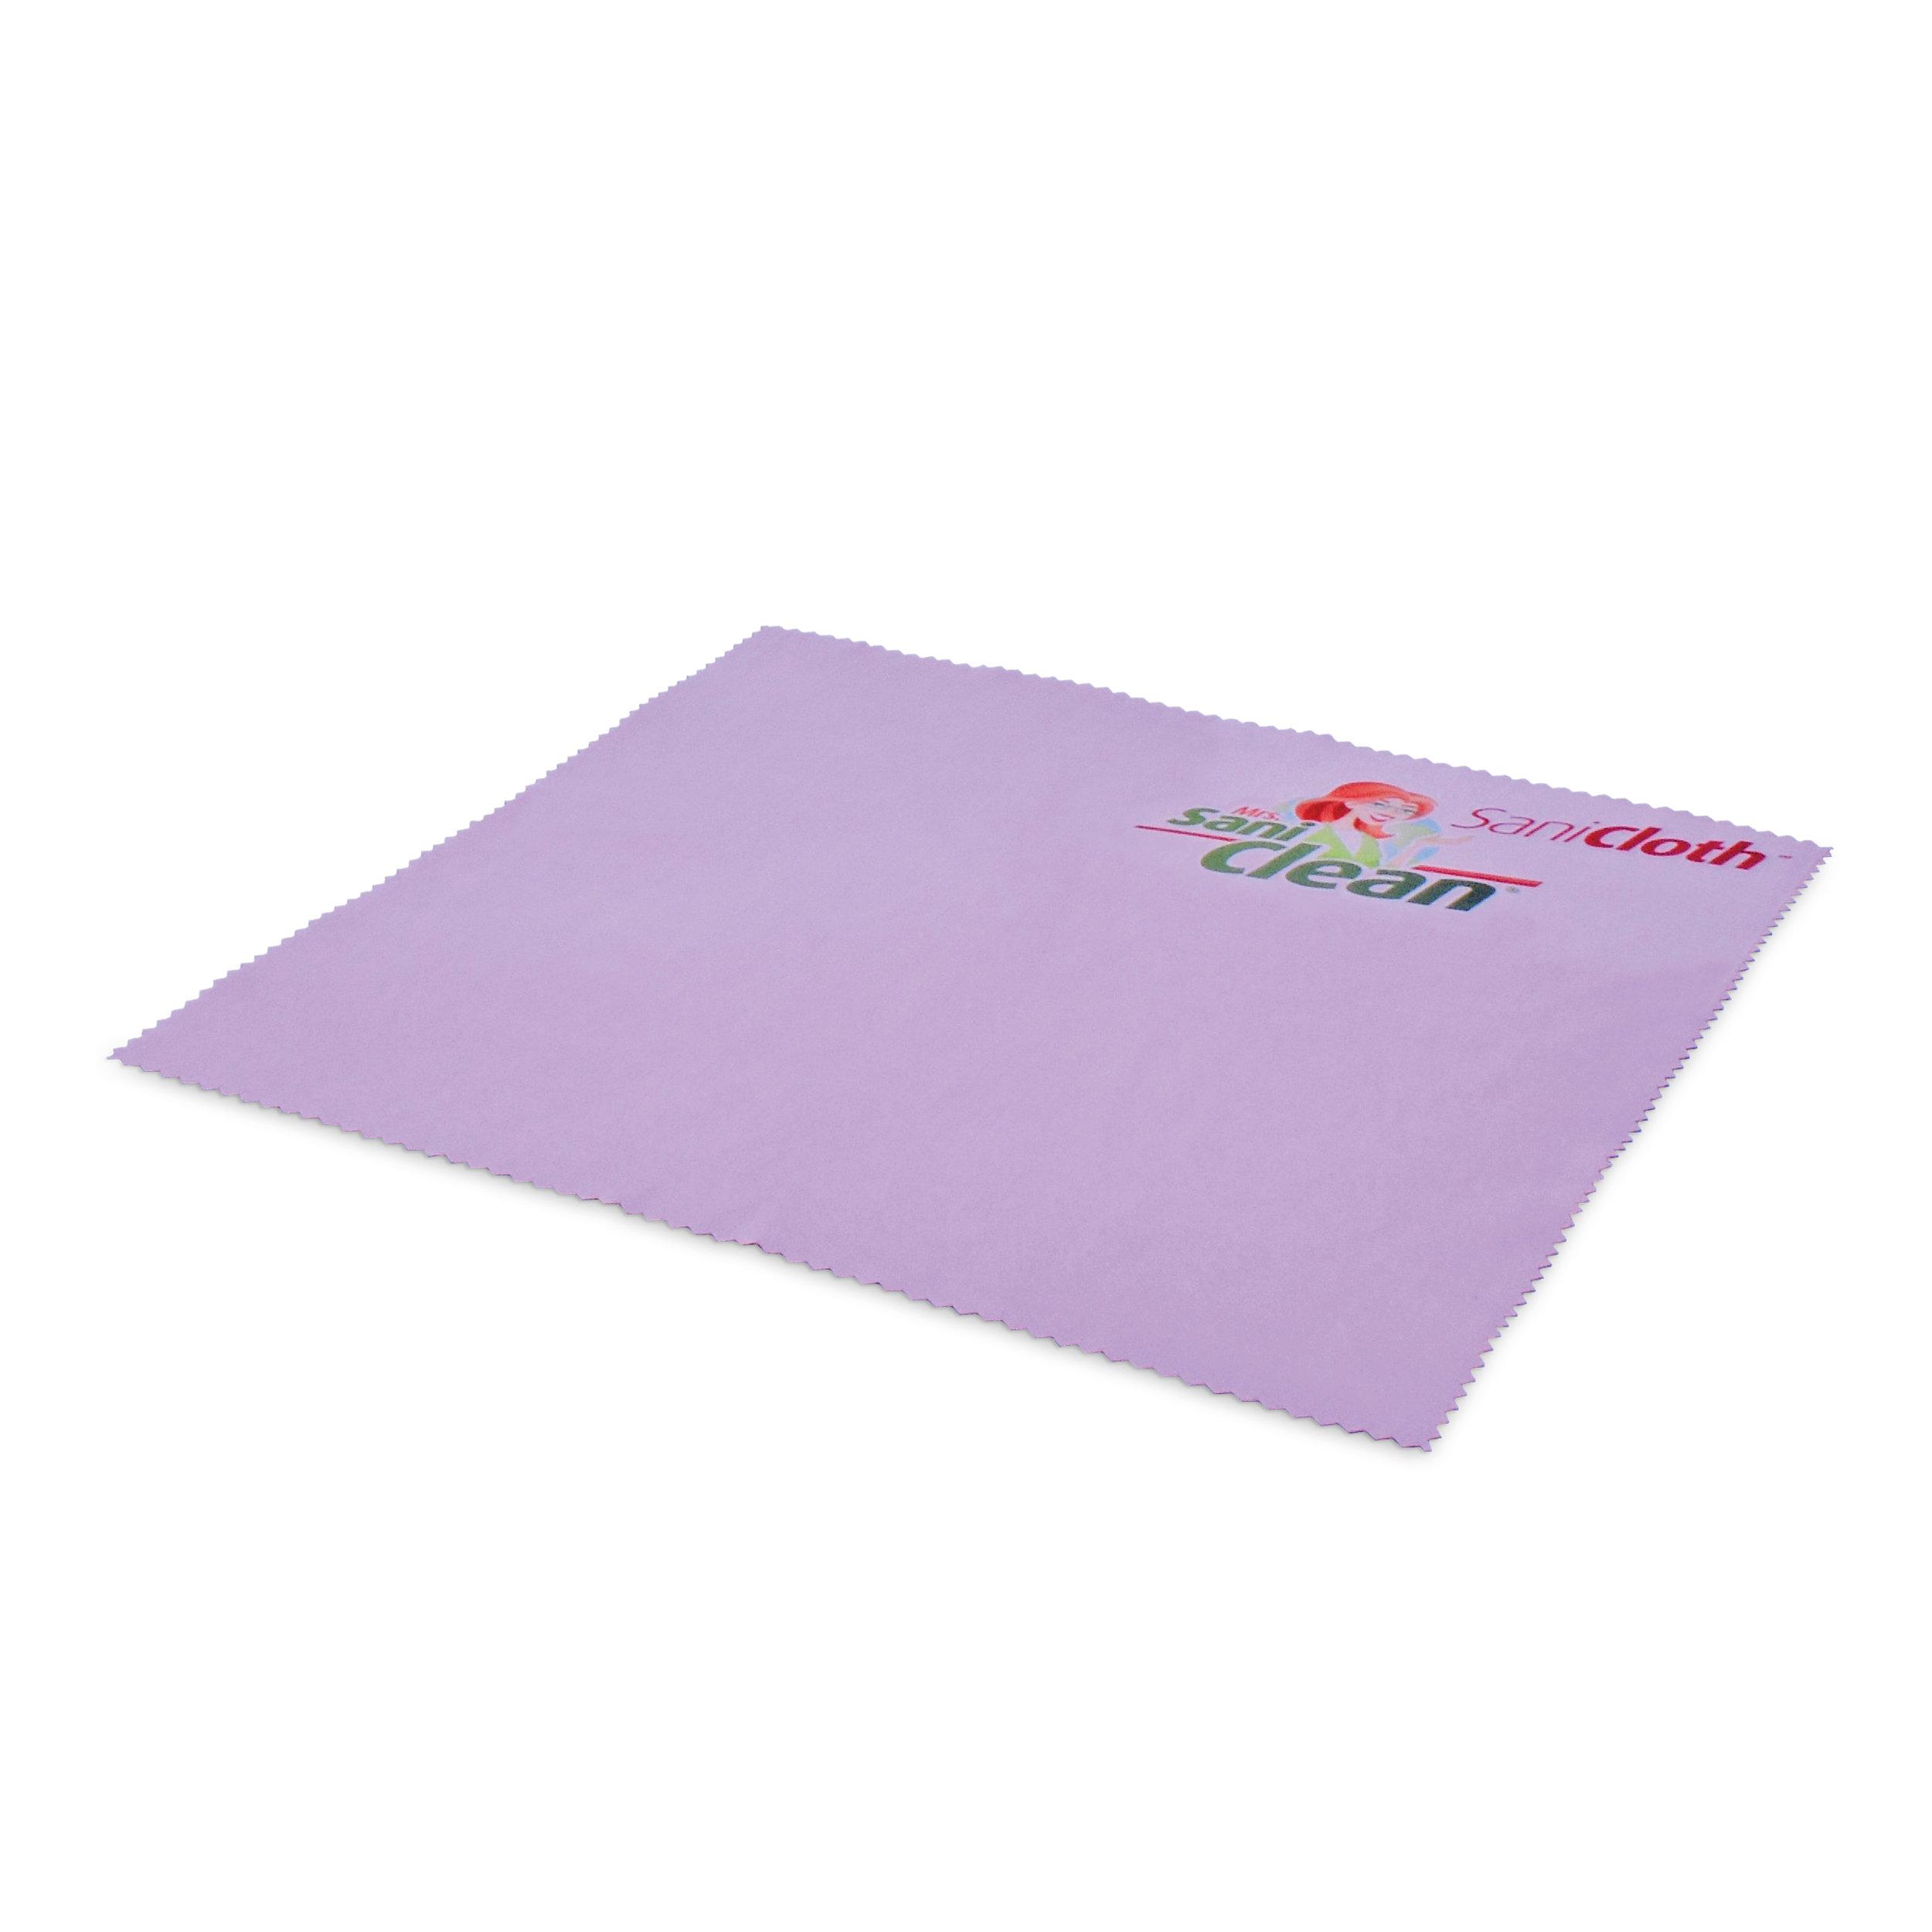 SaniCloth - Mrs. SaniClean's SaniCloth is a handy 6